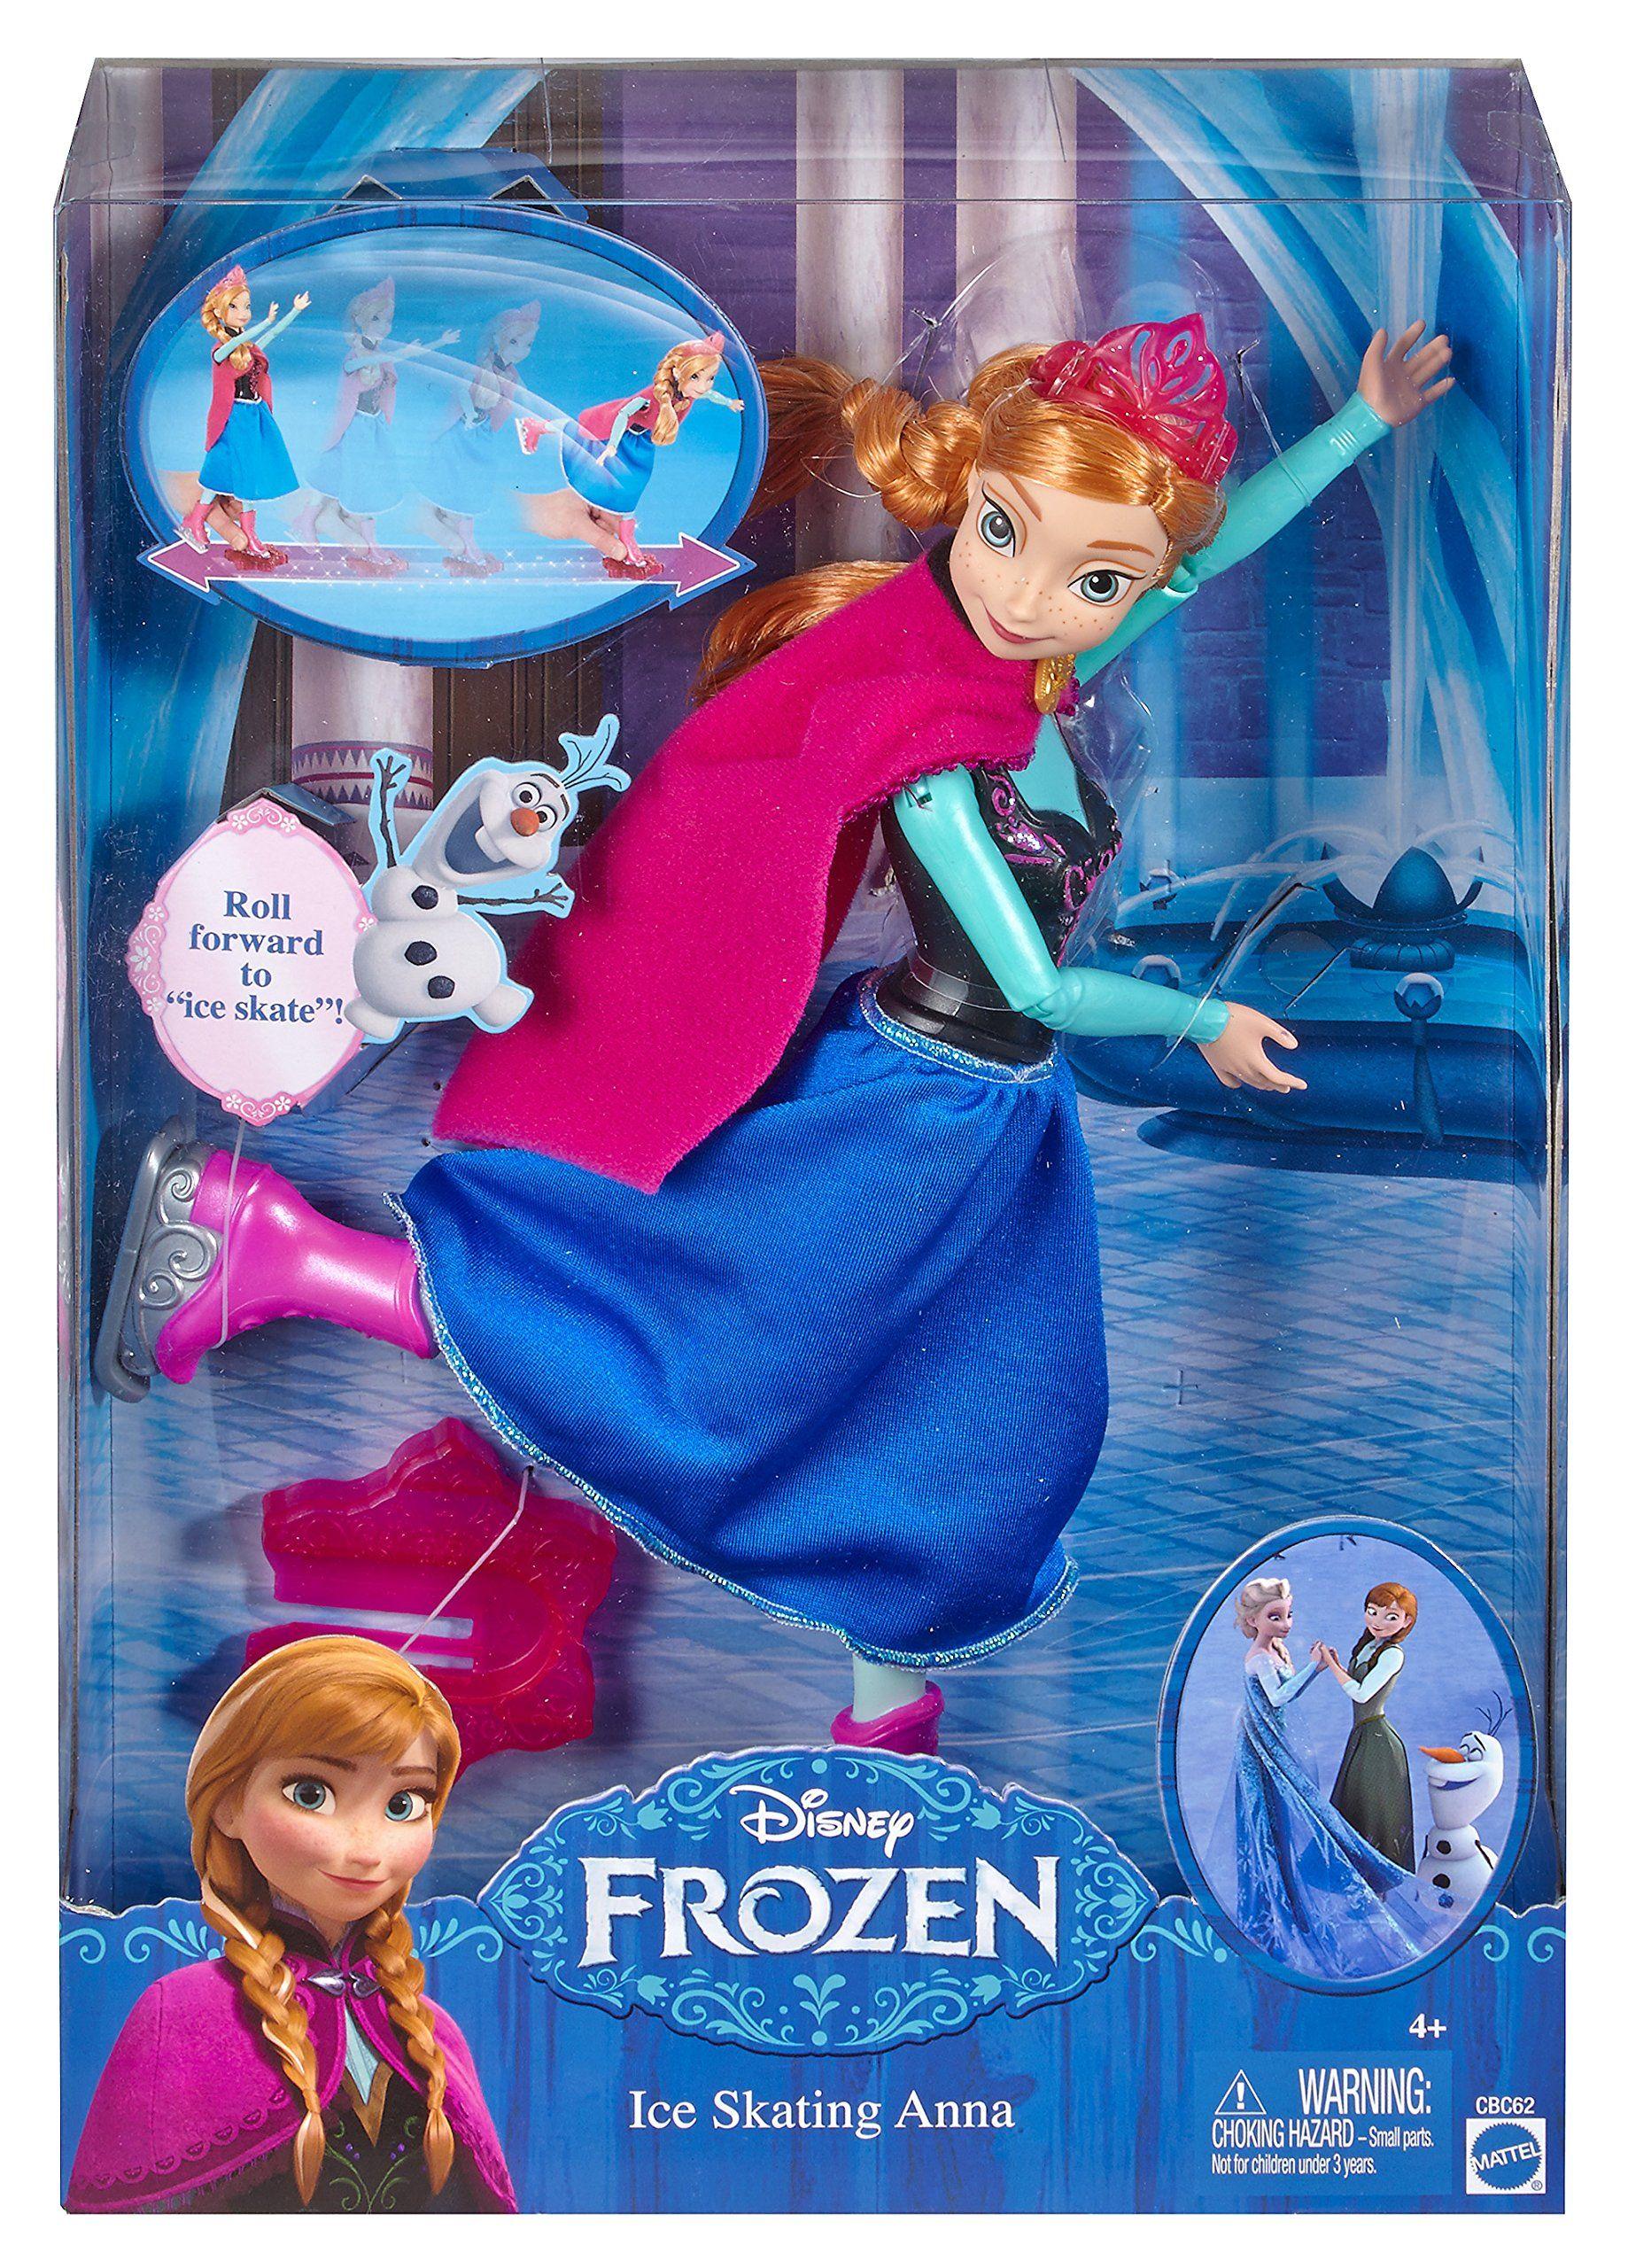 Robot Check Disney frozen, Frozen dolls, Anna doll